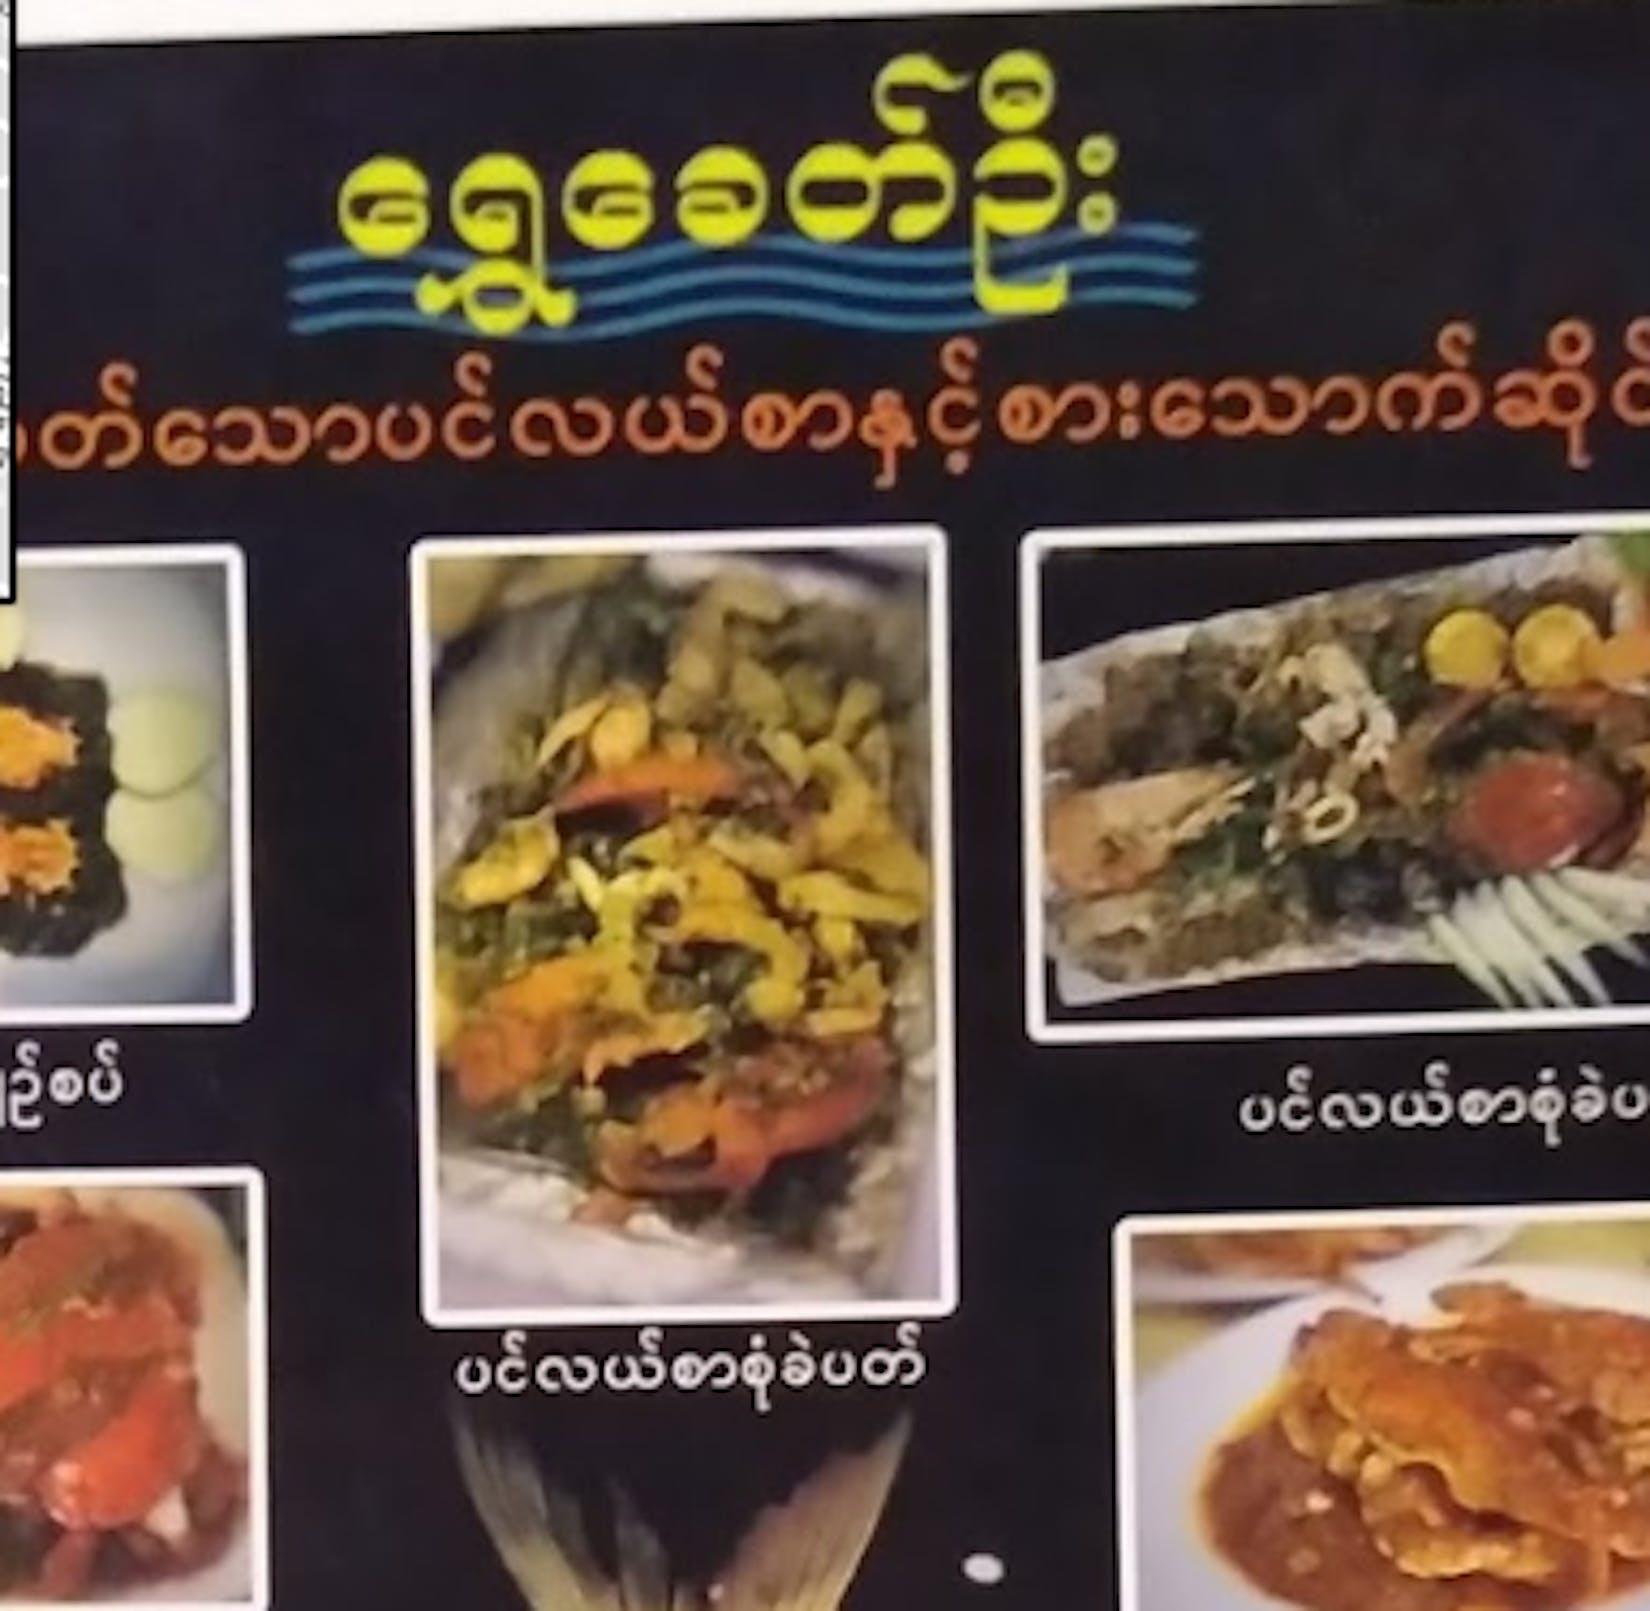 Shwe Khit Oo | yathar